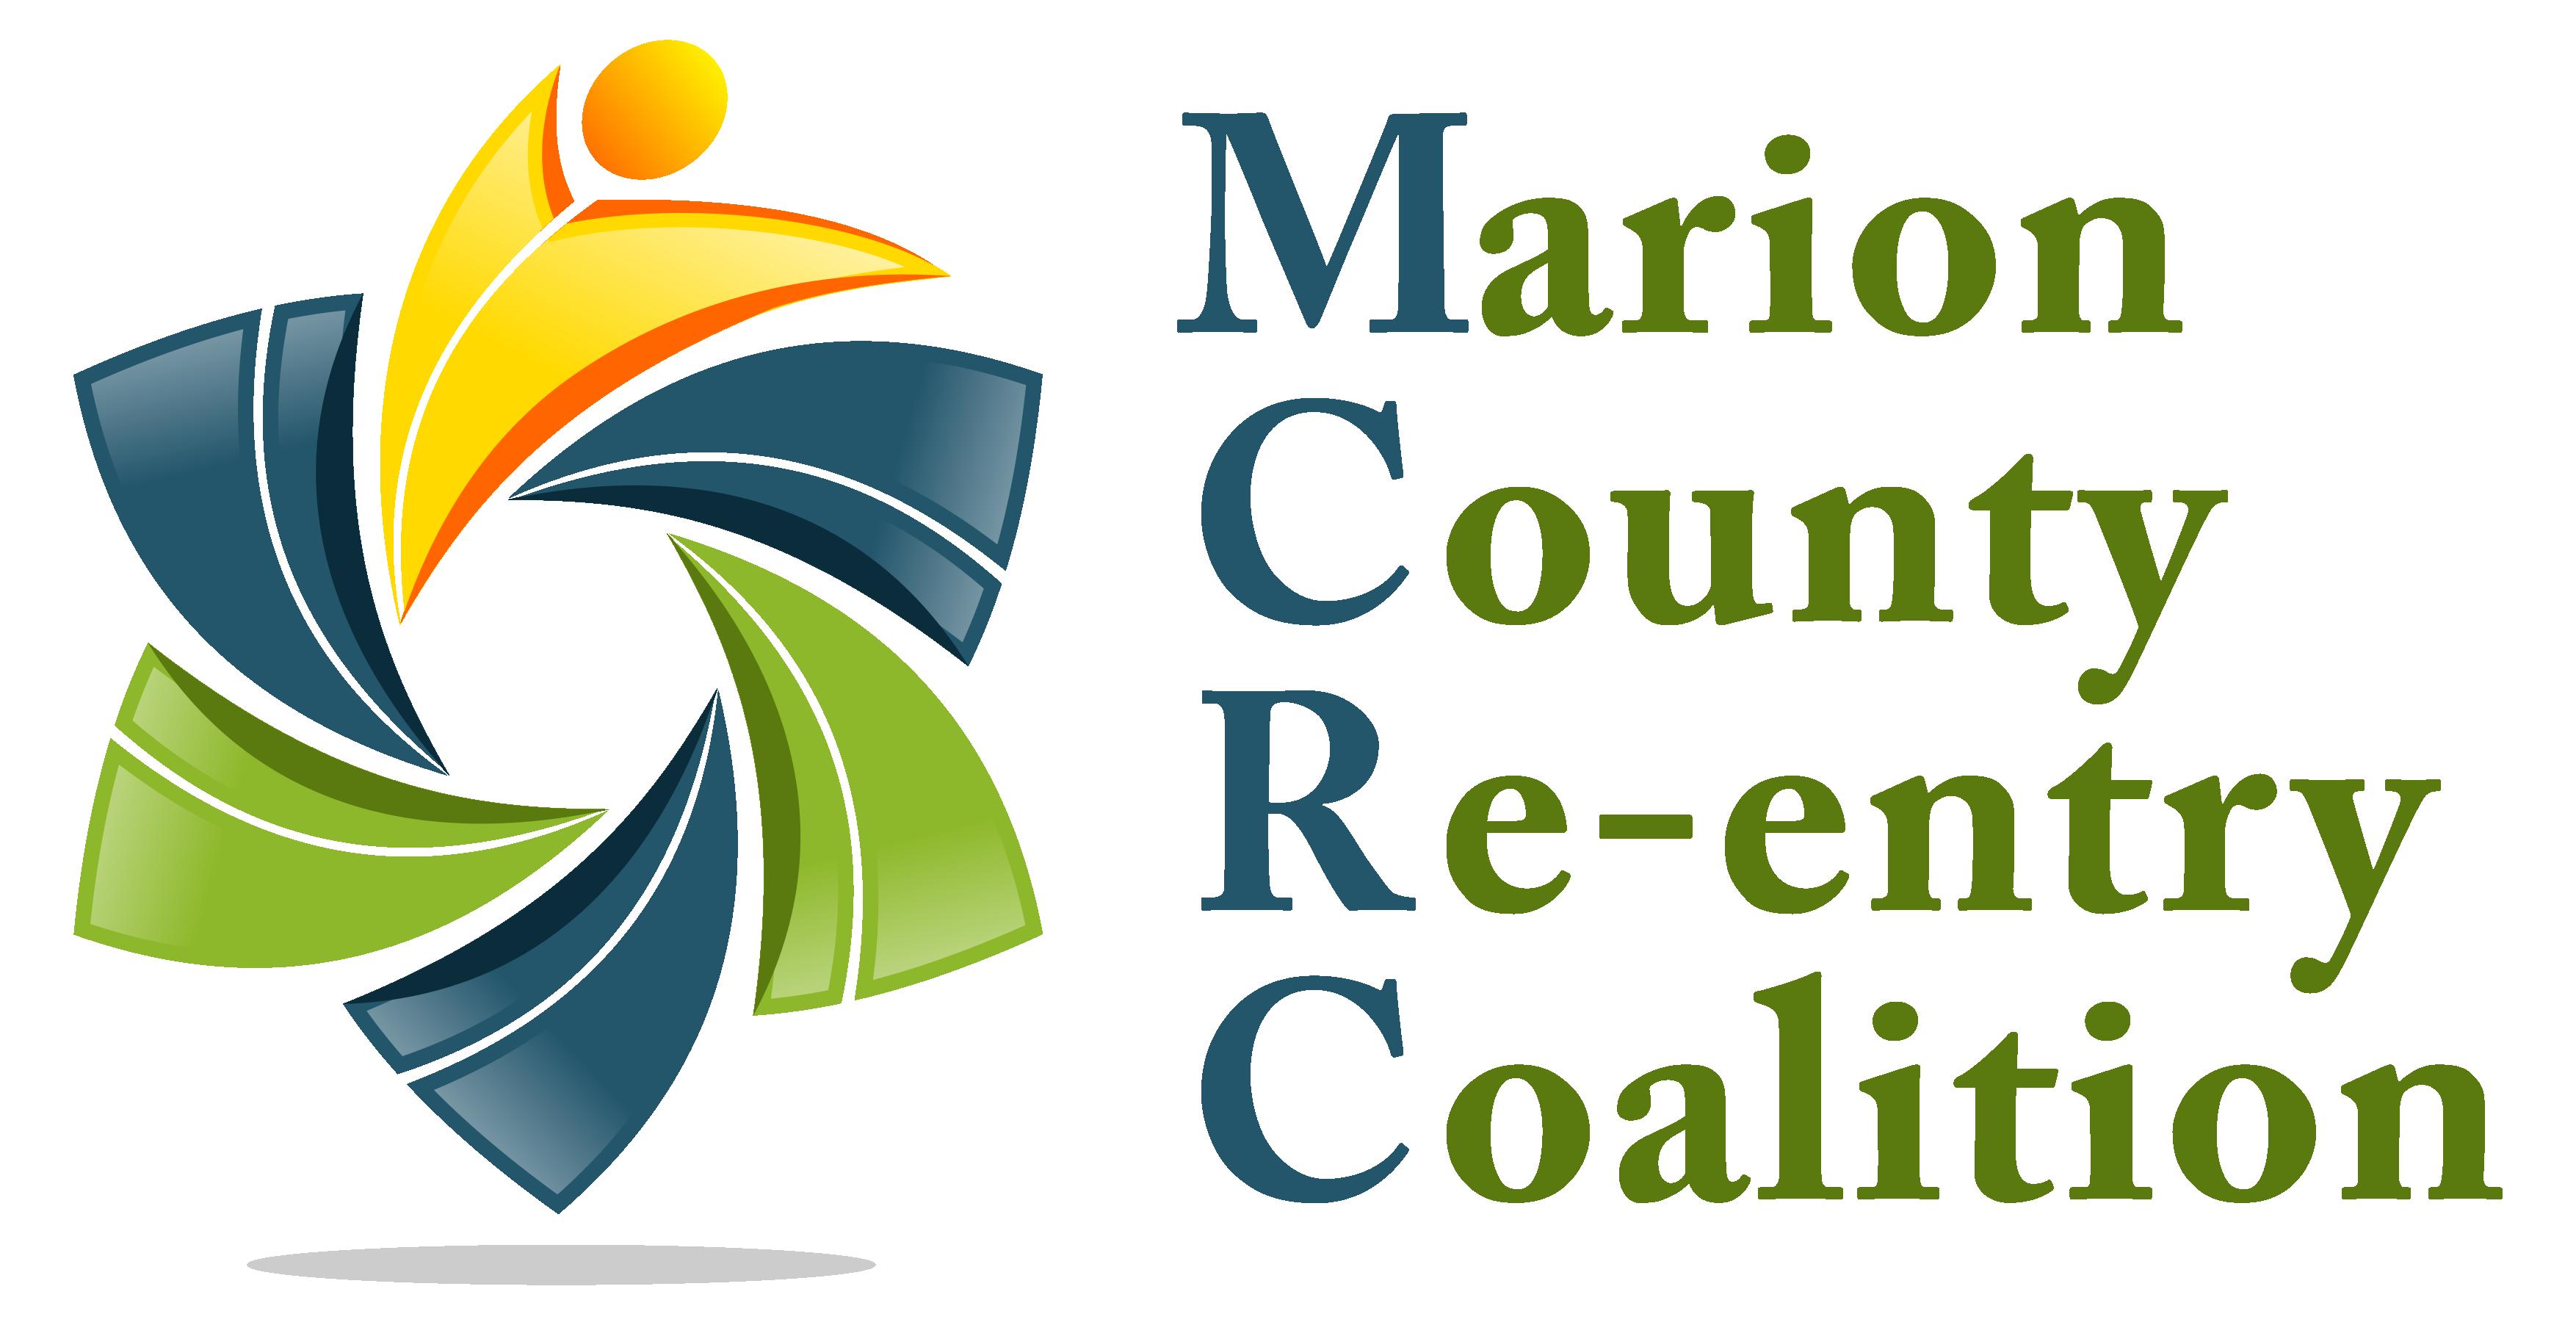 Marion County Re-entry Coalition Logo